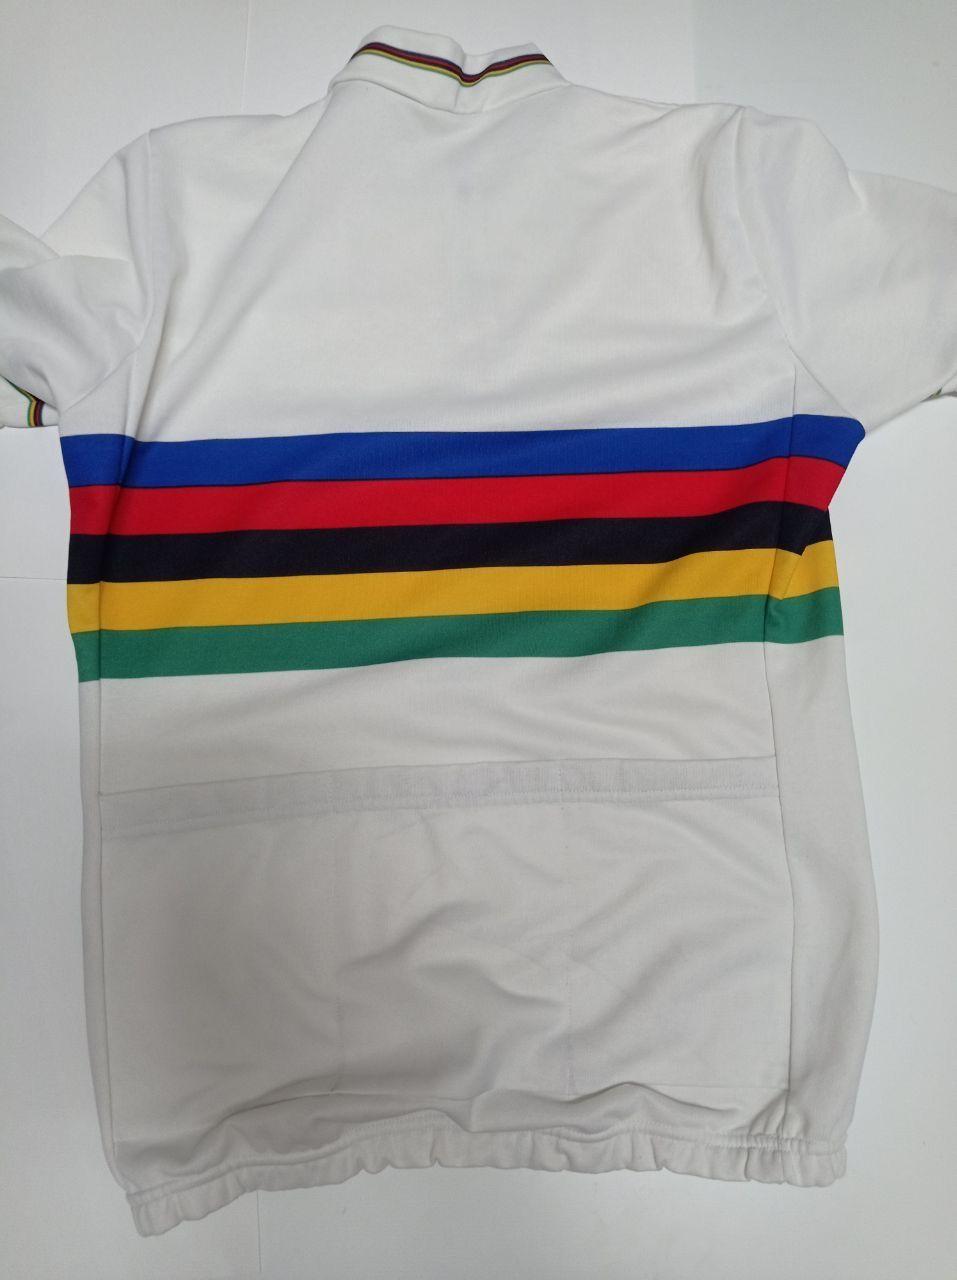 Джерси UCI Santini